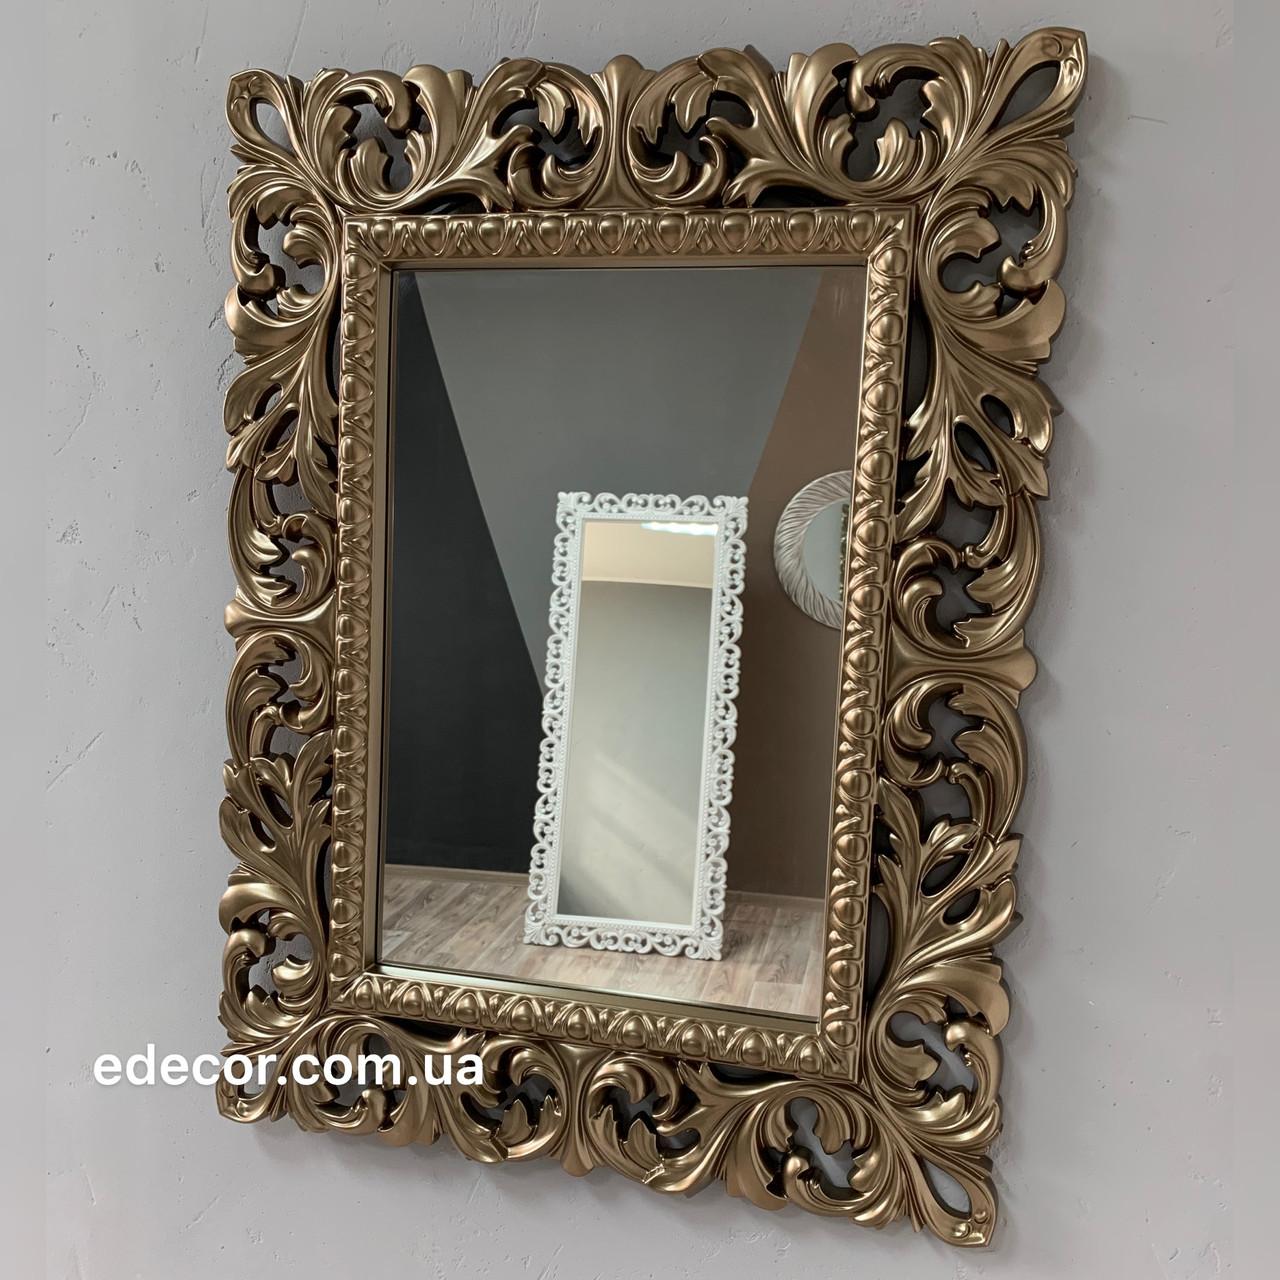 Зеркало настенное в раме бронзового цвета Dodoma